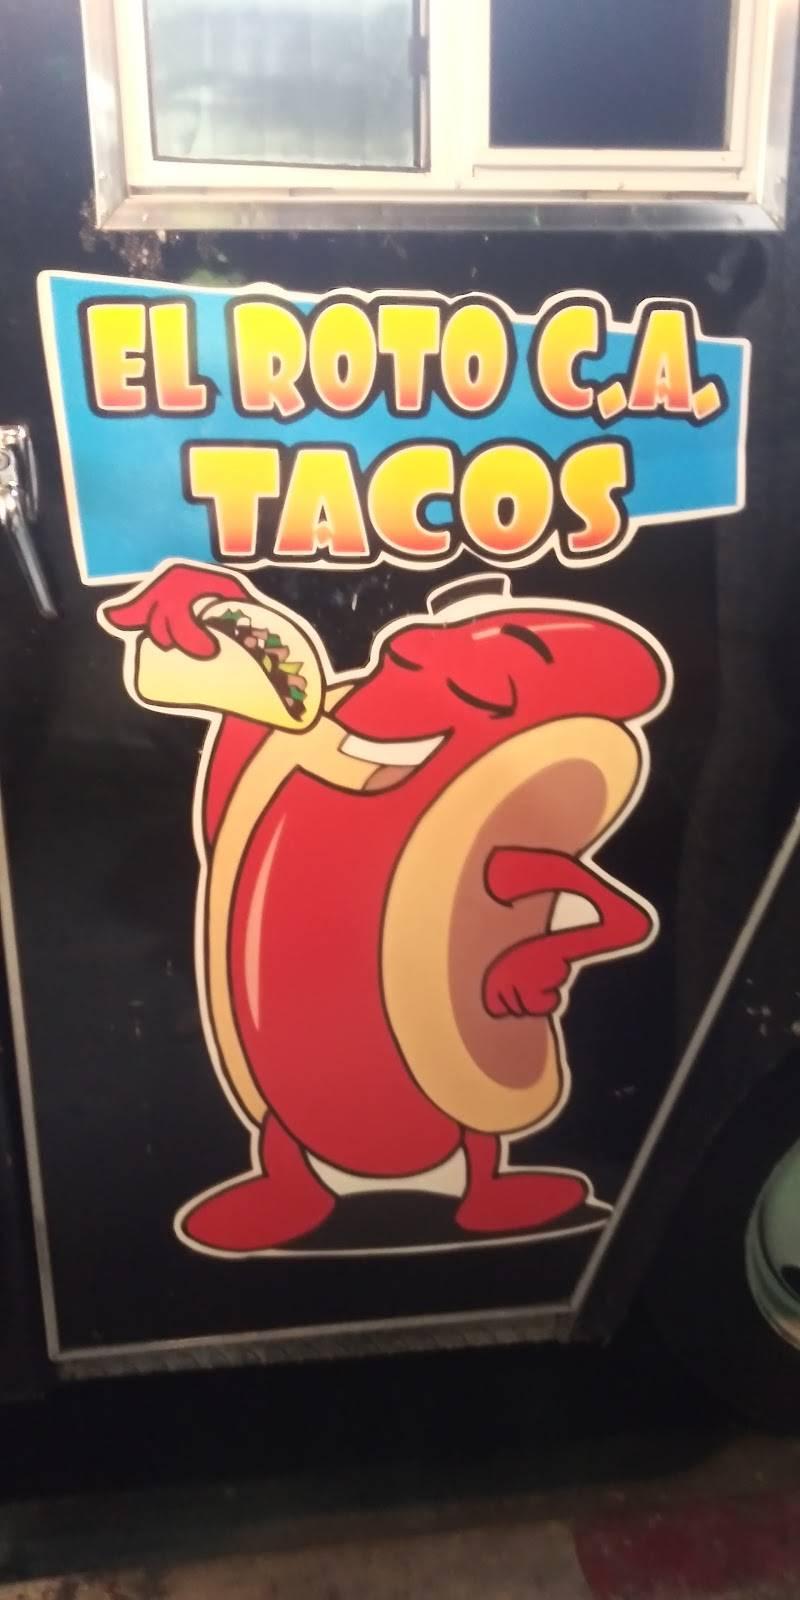 Tacos el roto | restaurant | 1022 Locust Ave, Long Beach, CA 90813, USA | 3233356261 OR +1 323-335-6261